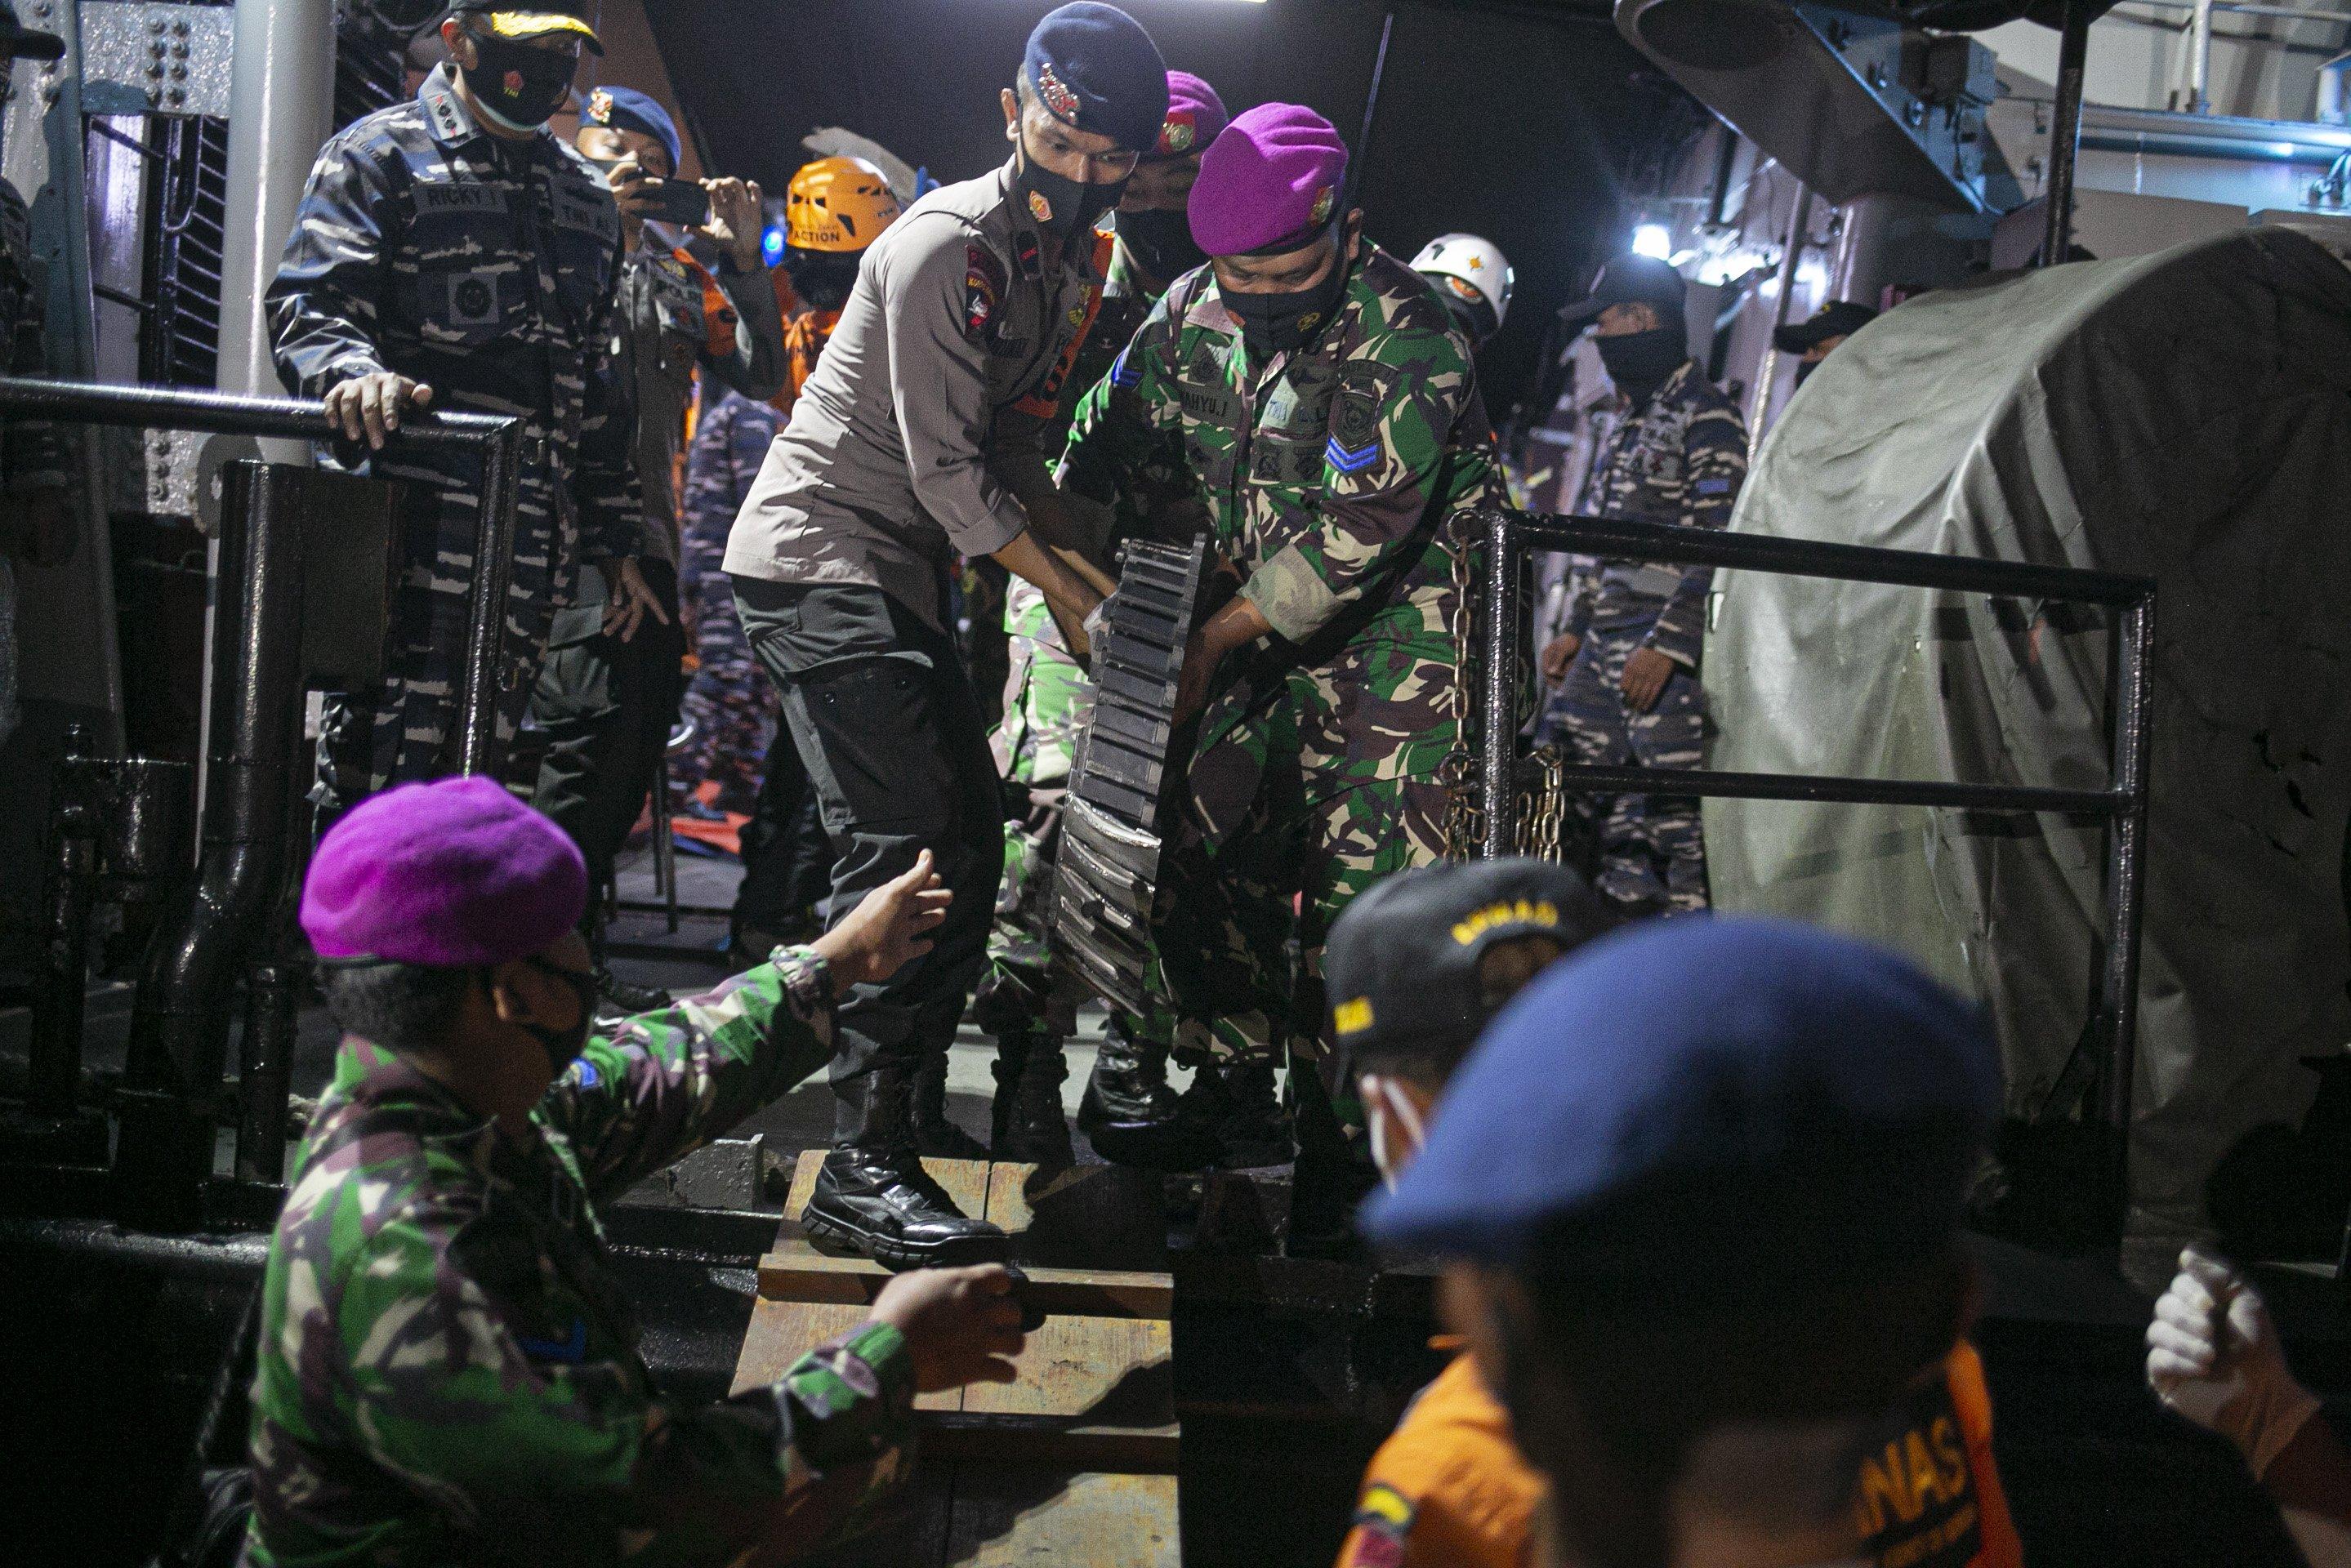 Petugas gabungan membawa bagian pesawat Sriwijaya Air SJ182 rute Jakarta - Pontianak yang jatuh di perairan Pulau Seribu di Dermaga JICT, Tanjung Priok, Jakarta Utara, Minggu (10/1/2021). Temuan bagian pesawat selanjutnya akan diperiksa oleh Komite Nasional Keselamatan Transportasi (KNKT) sedangkan potongan tubuh korban diserahkan kepada DVI Polri untuk identifikasi lebih lanjut.